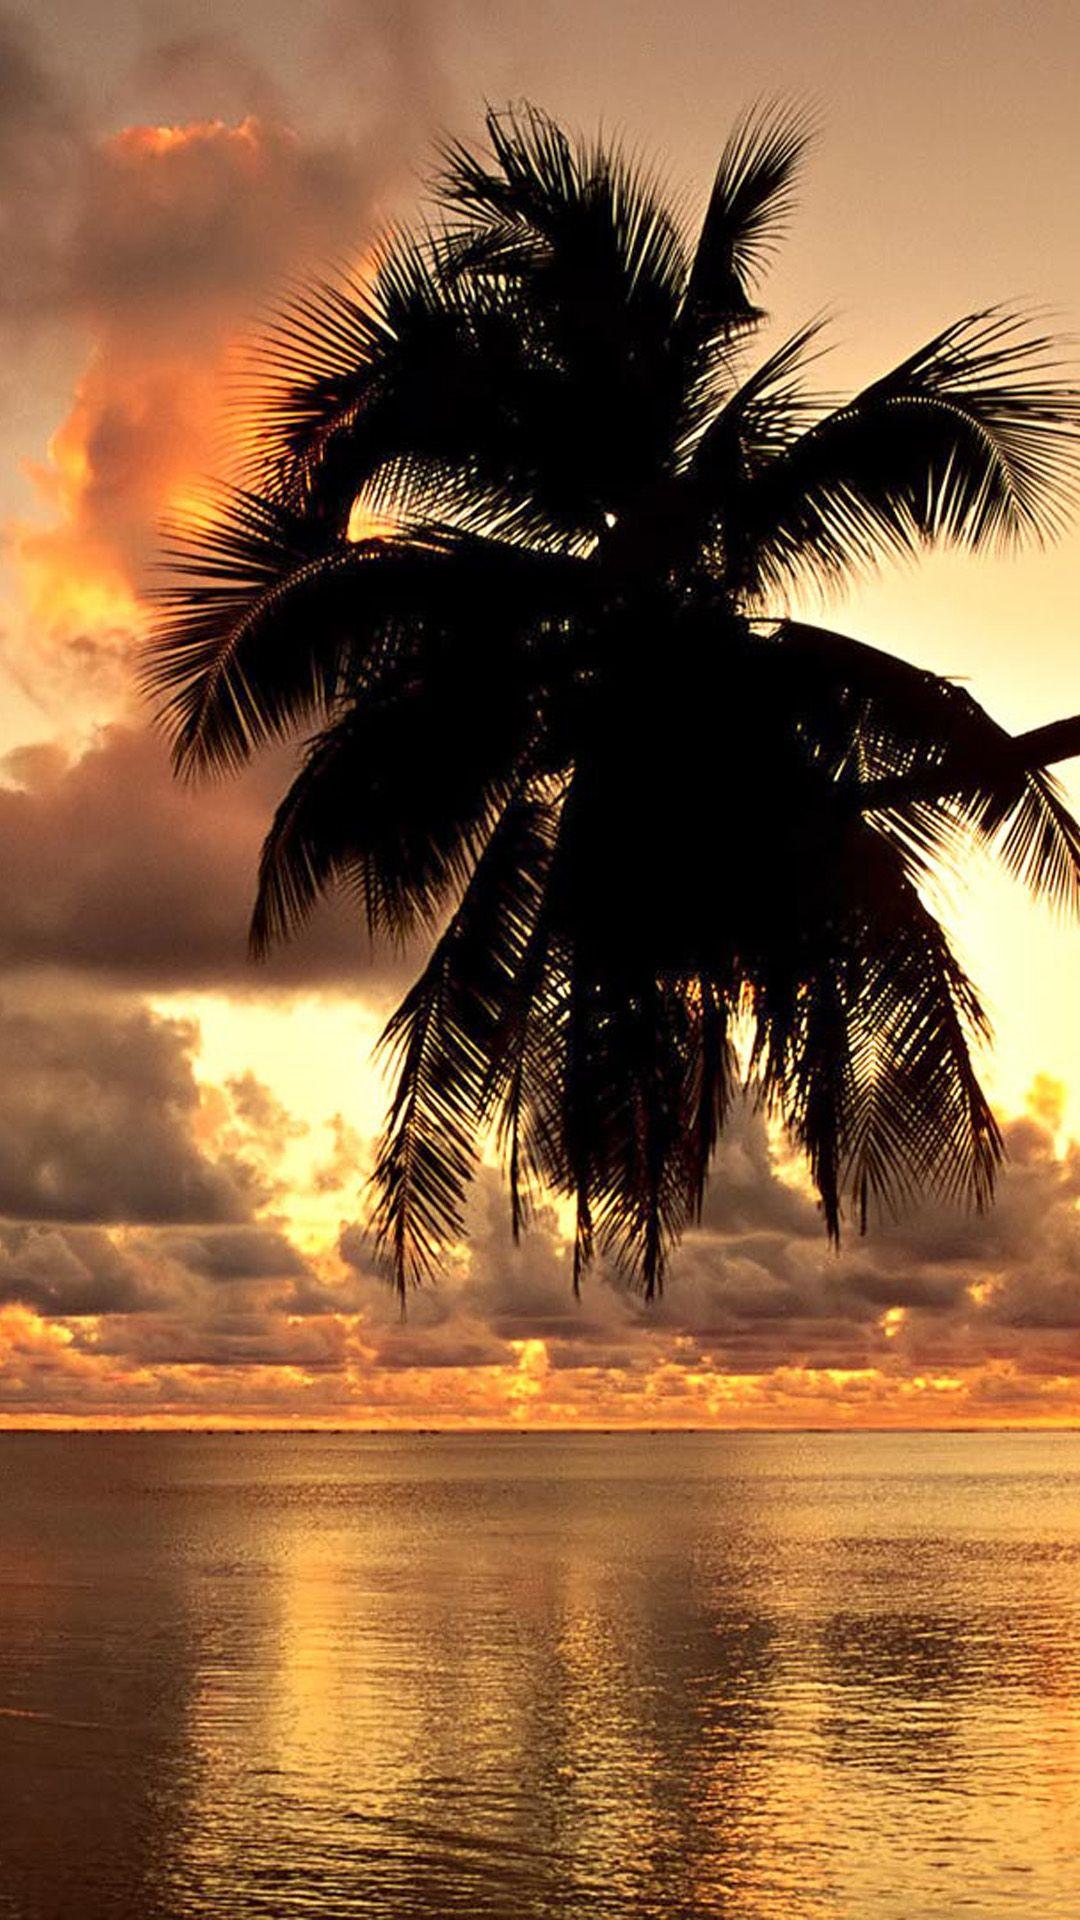 Wallpaper iphone tropical - Tropical Coast Sunset Iphone Wallpaper